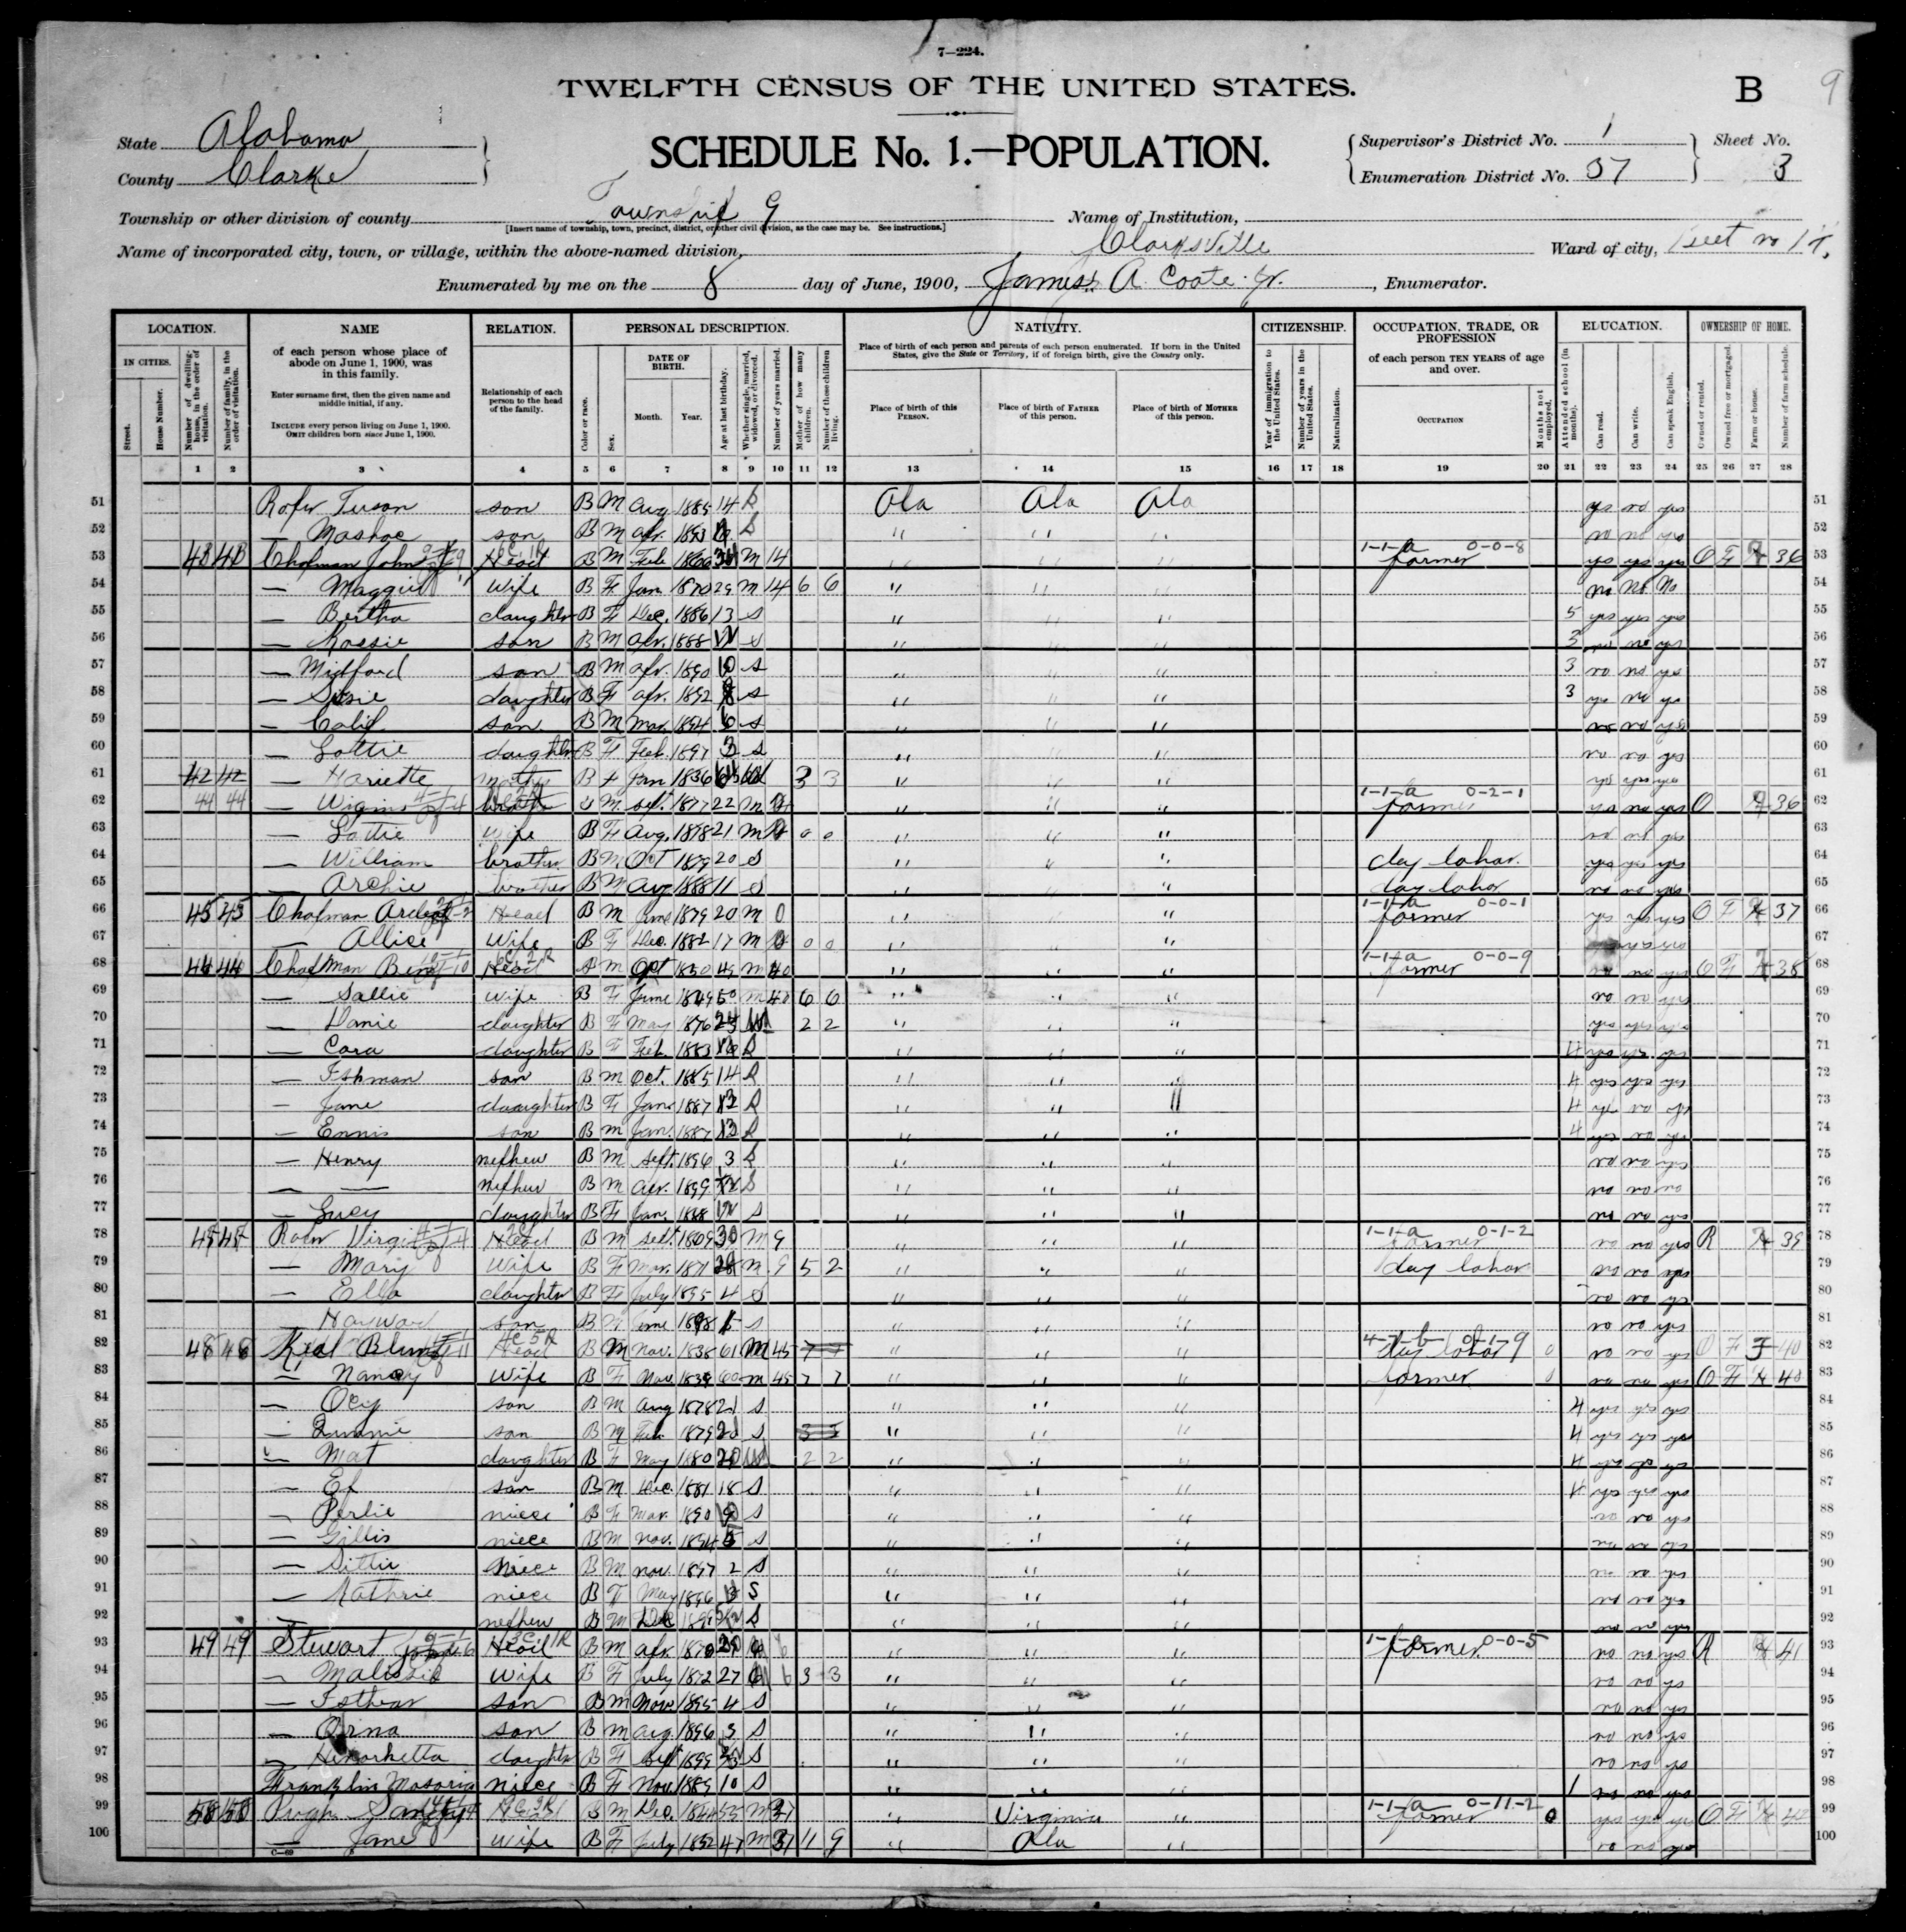 Alabama: CLARKE County, Enumeration District 37, Sheet No. 3B